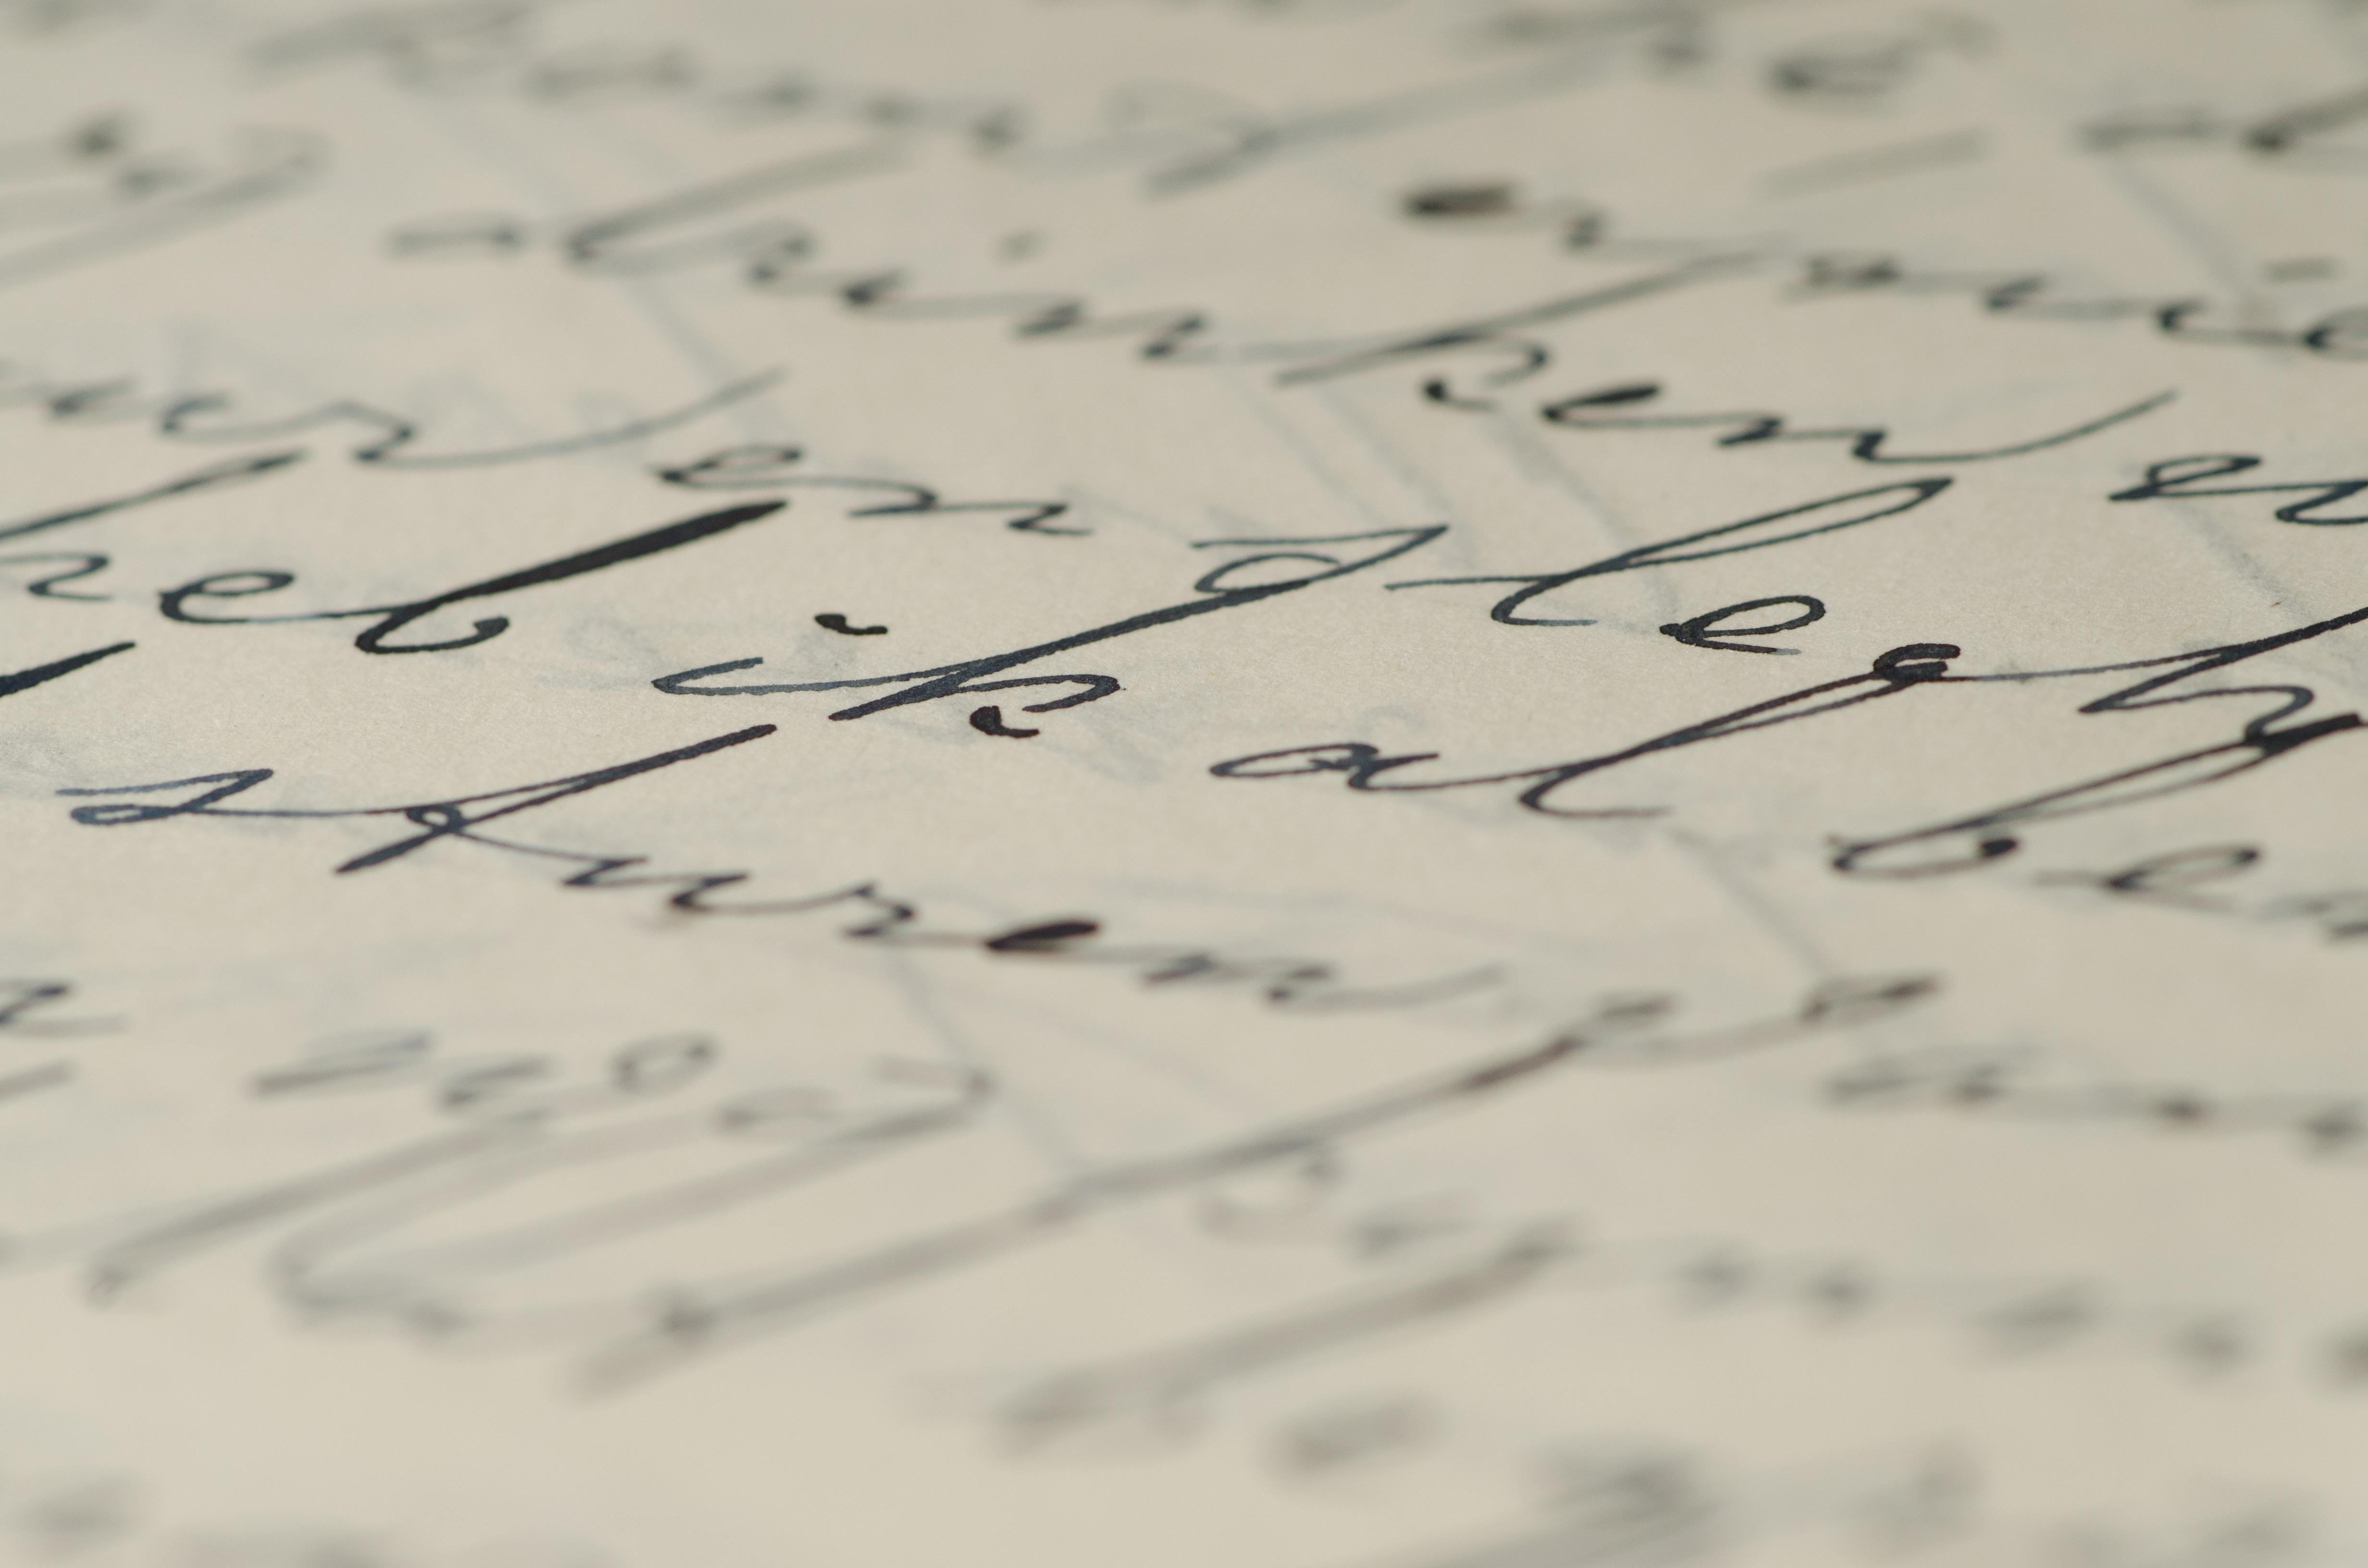 Free images writing number pen line letter ink close up